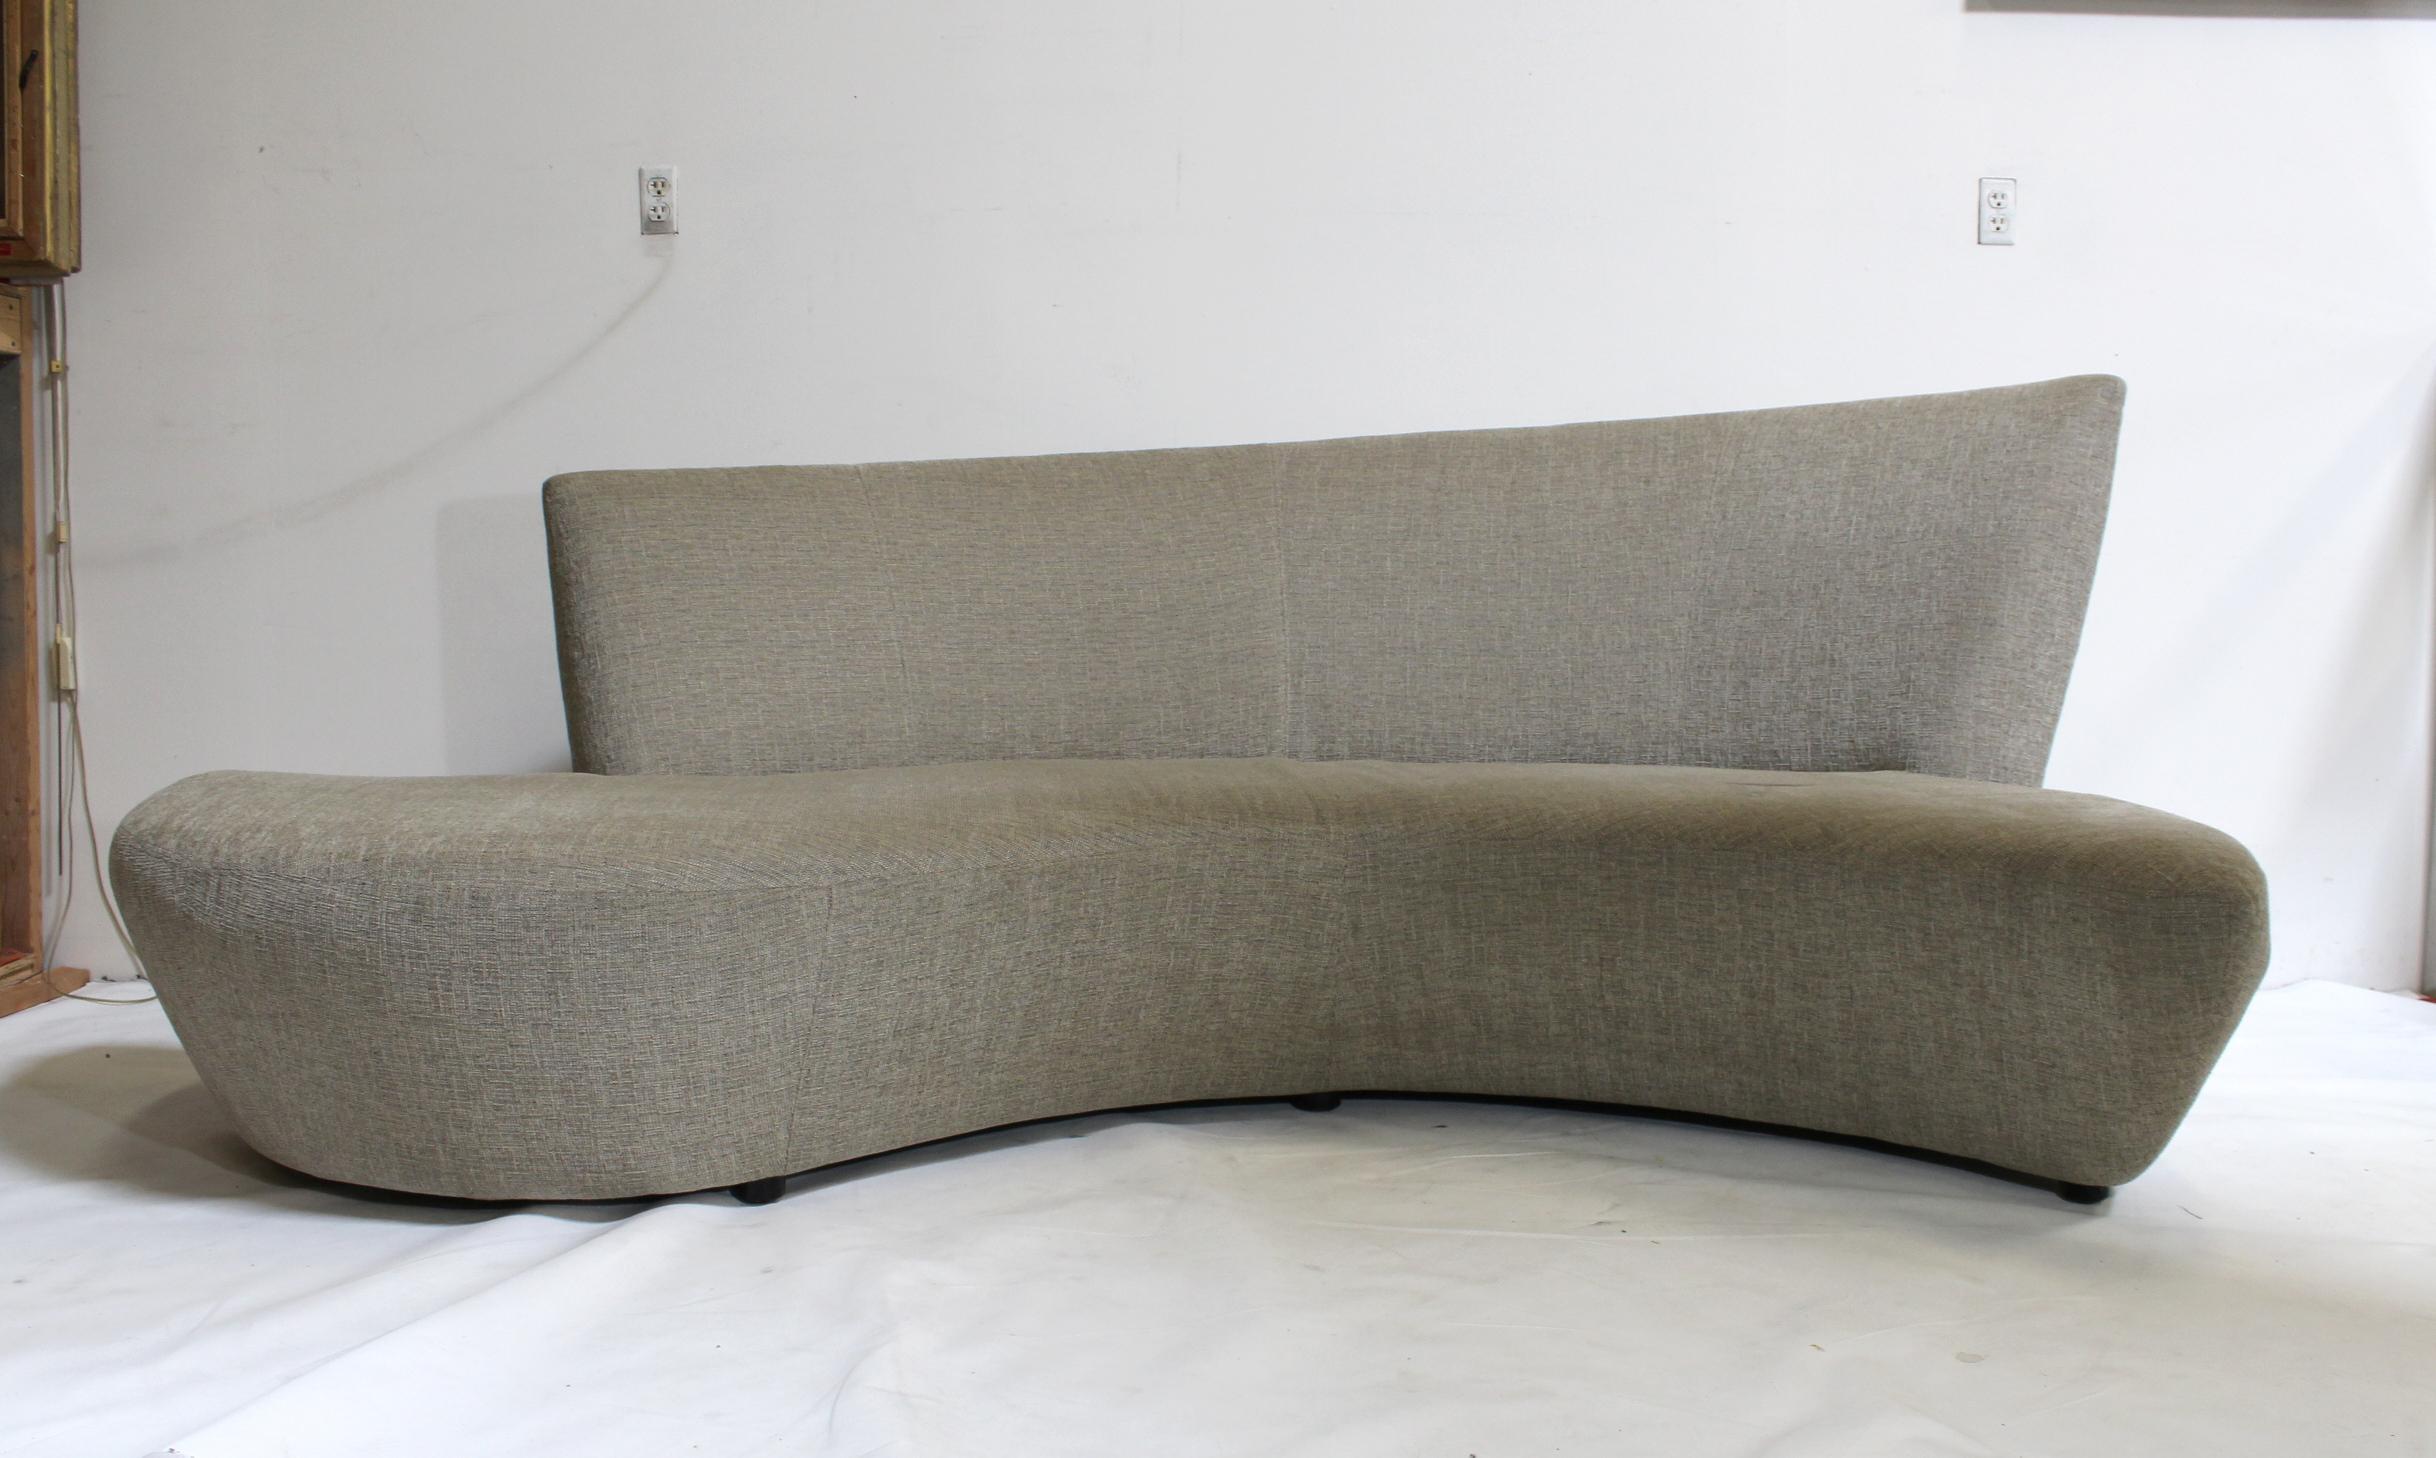 Vladimir Kagan For Weiman Sculptural Bilbao Sofa   Image 4 Of 10